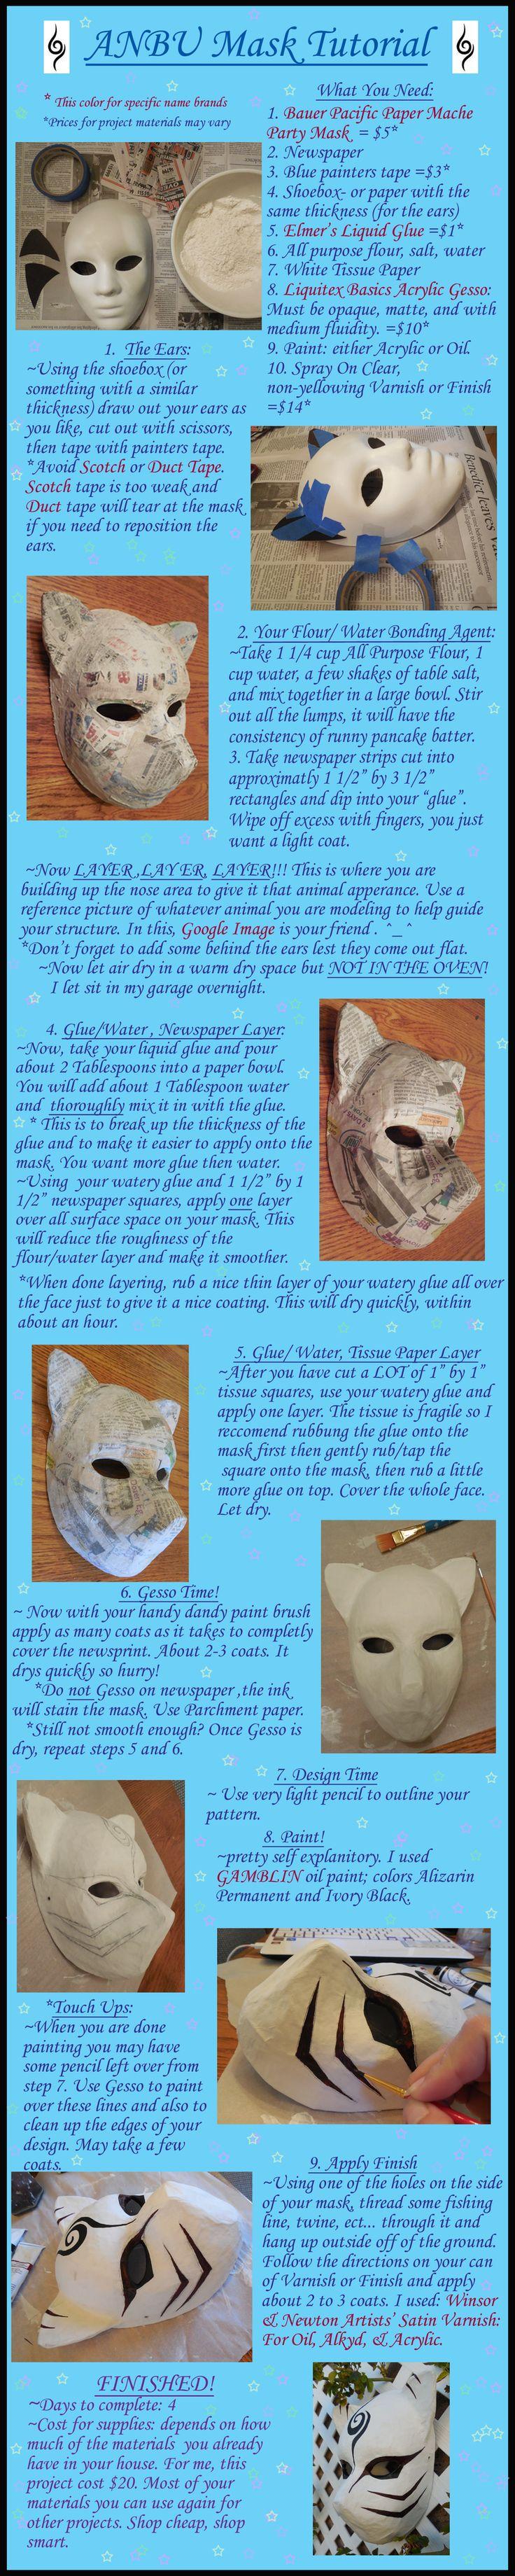 Papermache ANBU Mask Tutorial by AgentShoemaker